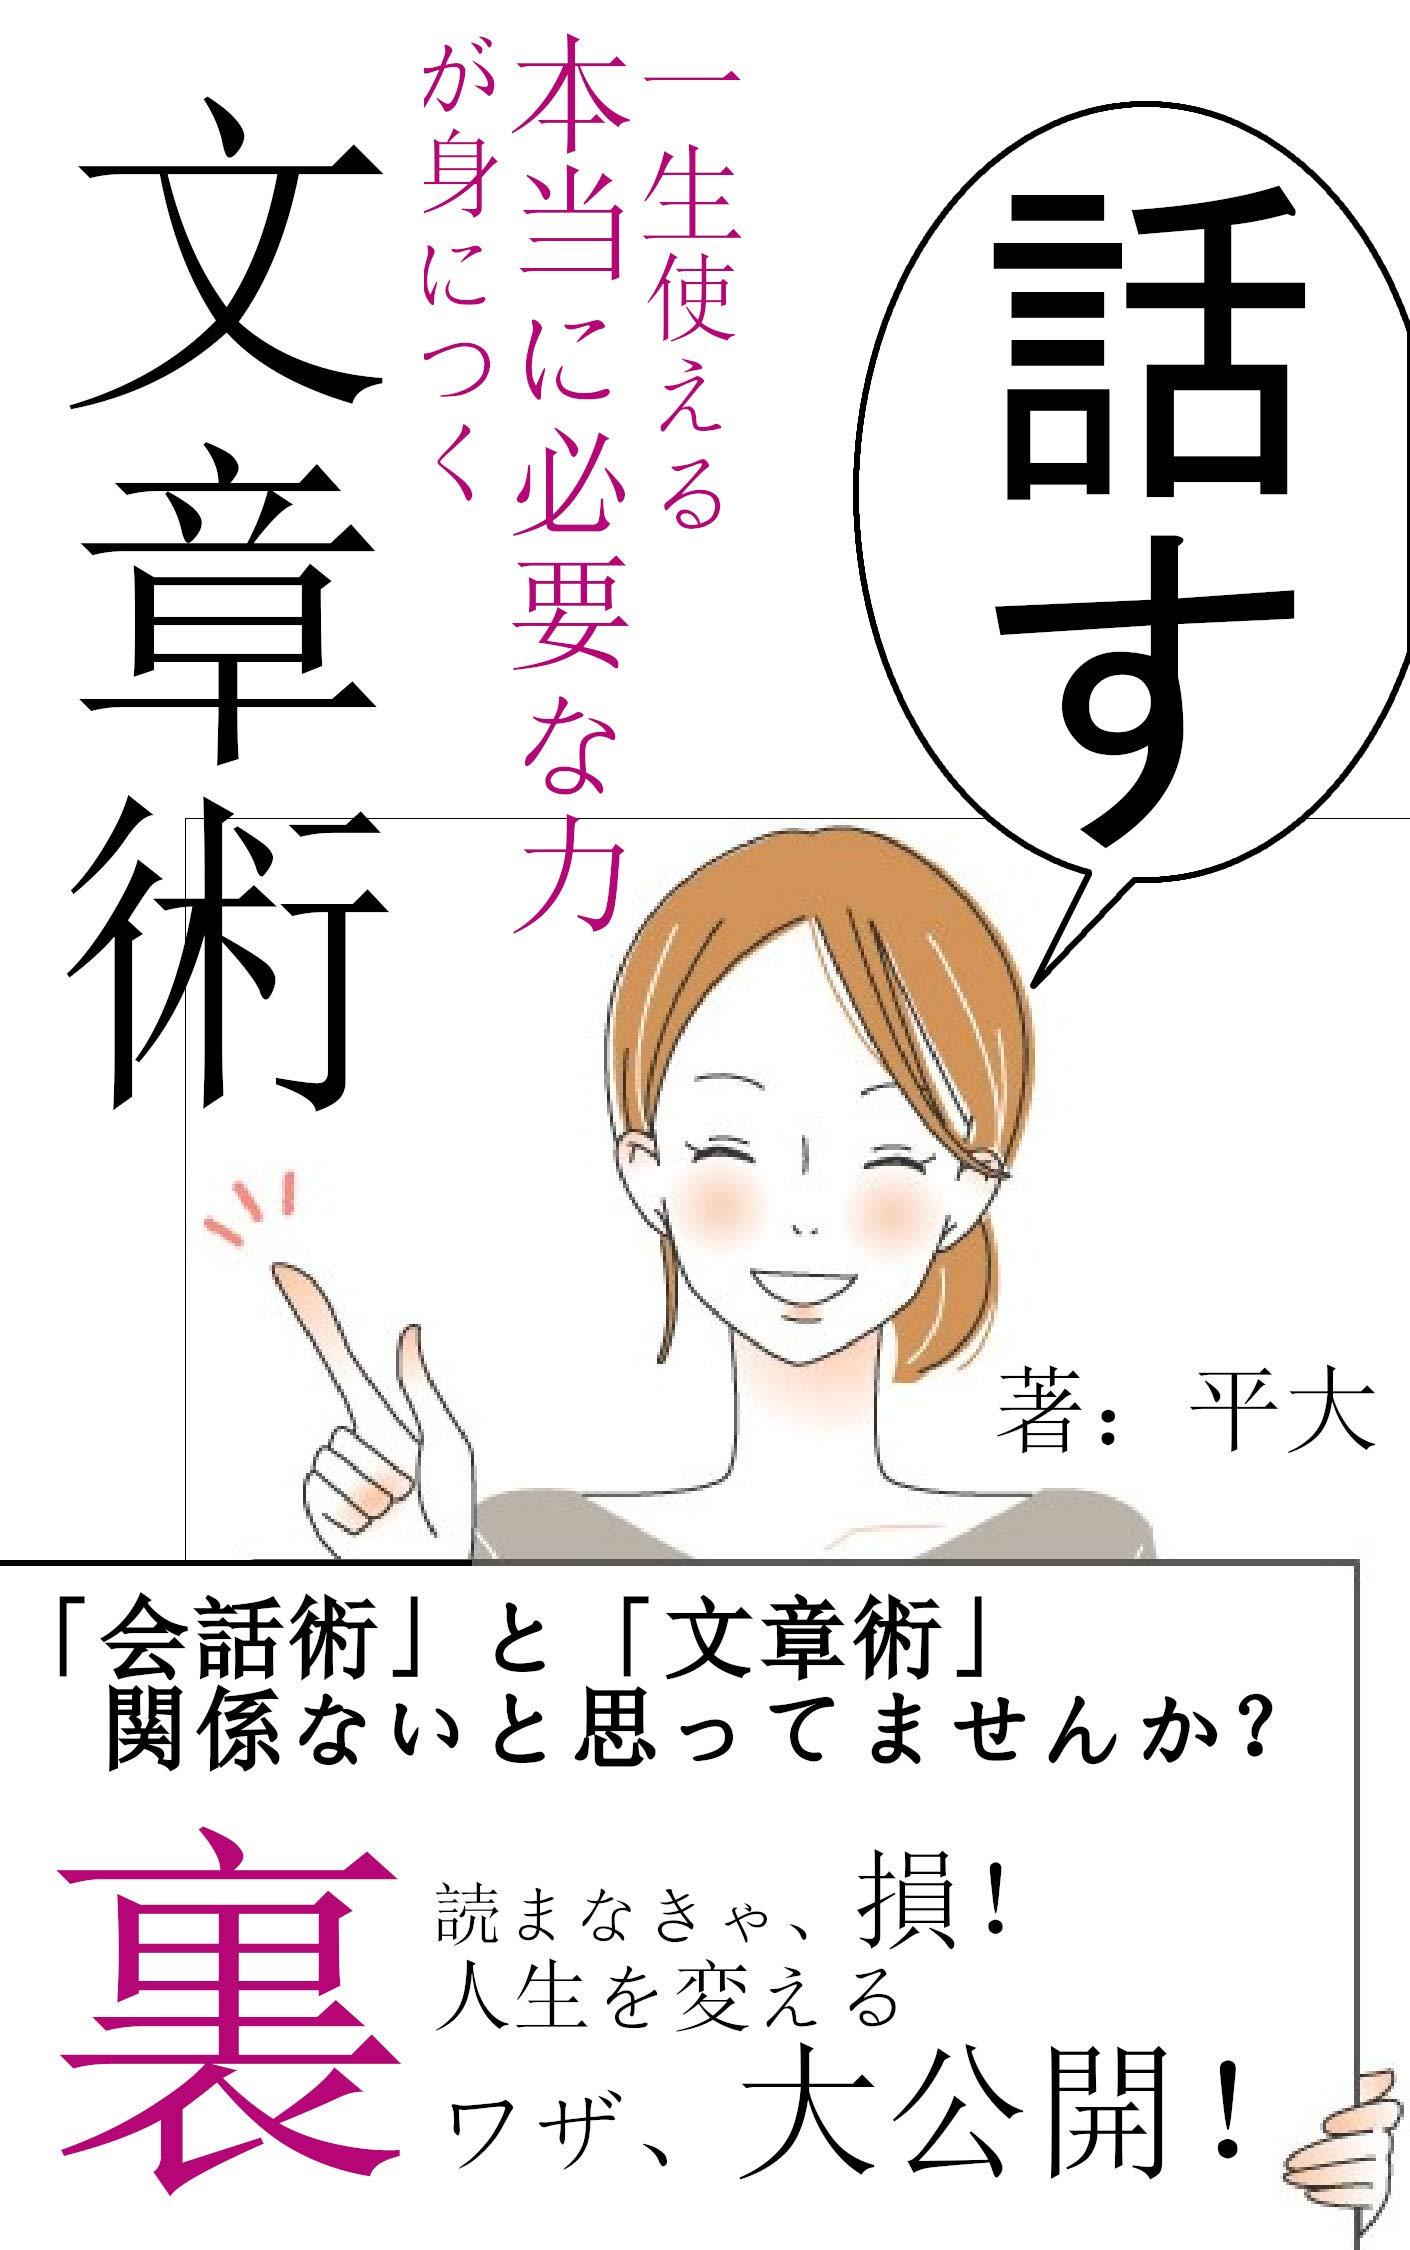 Hanasubunshozyutsu: Issyotukaeruhontonihituyonatikaragaminituku (Japanese Edition)